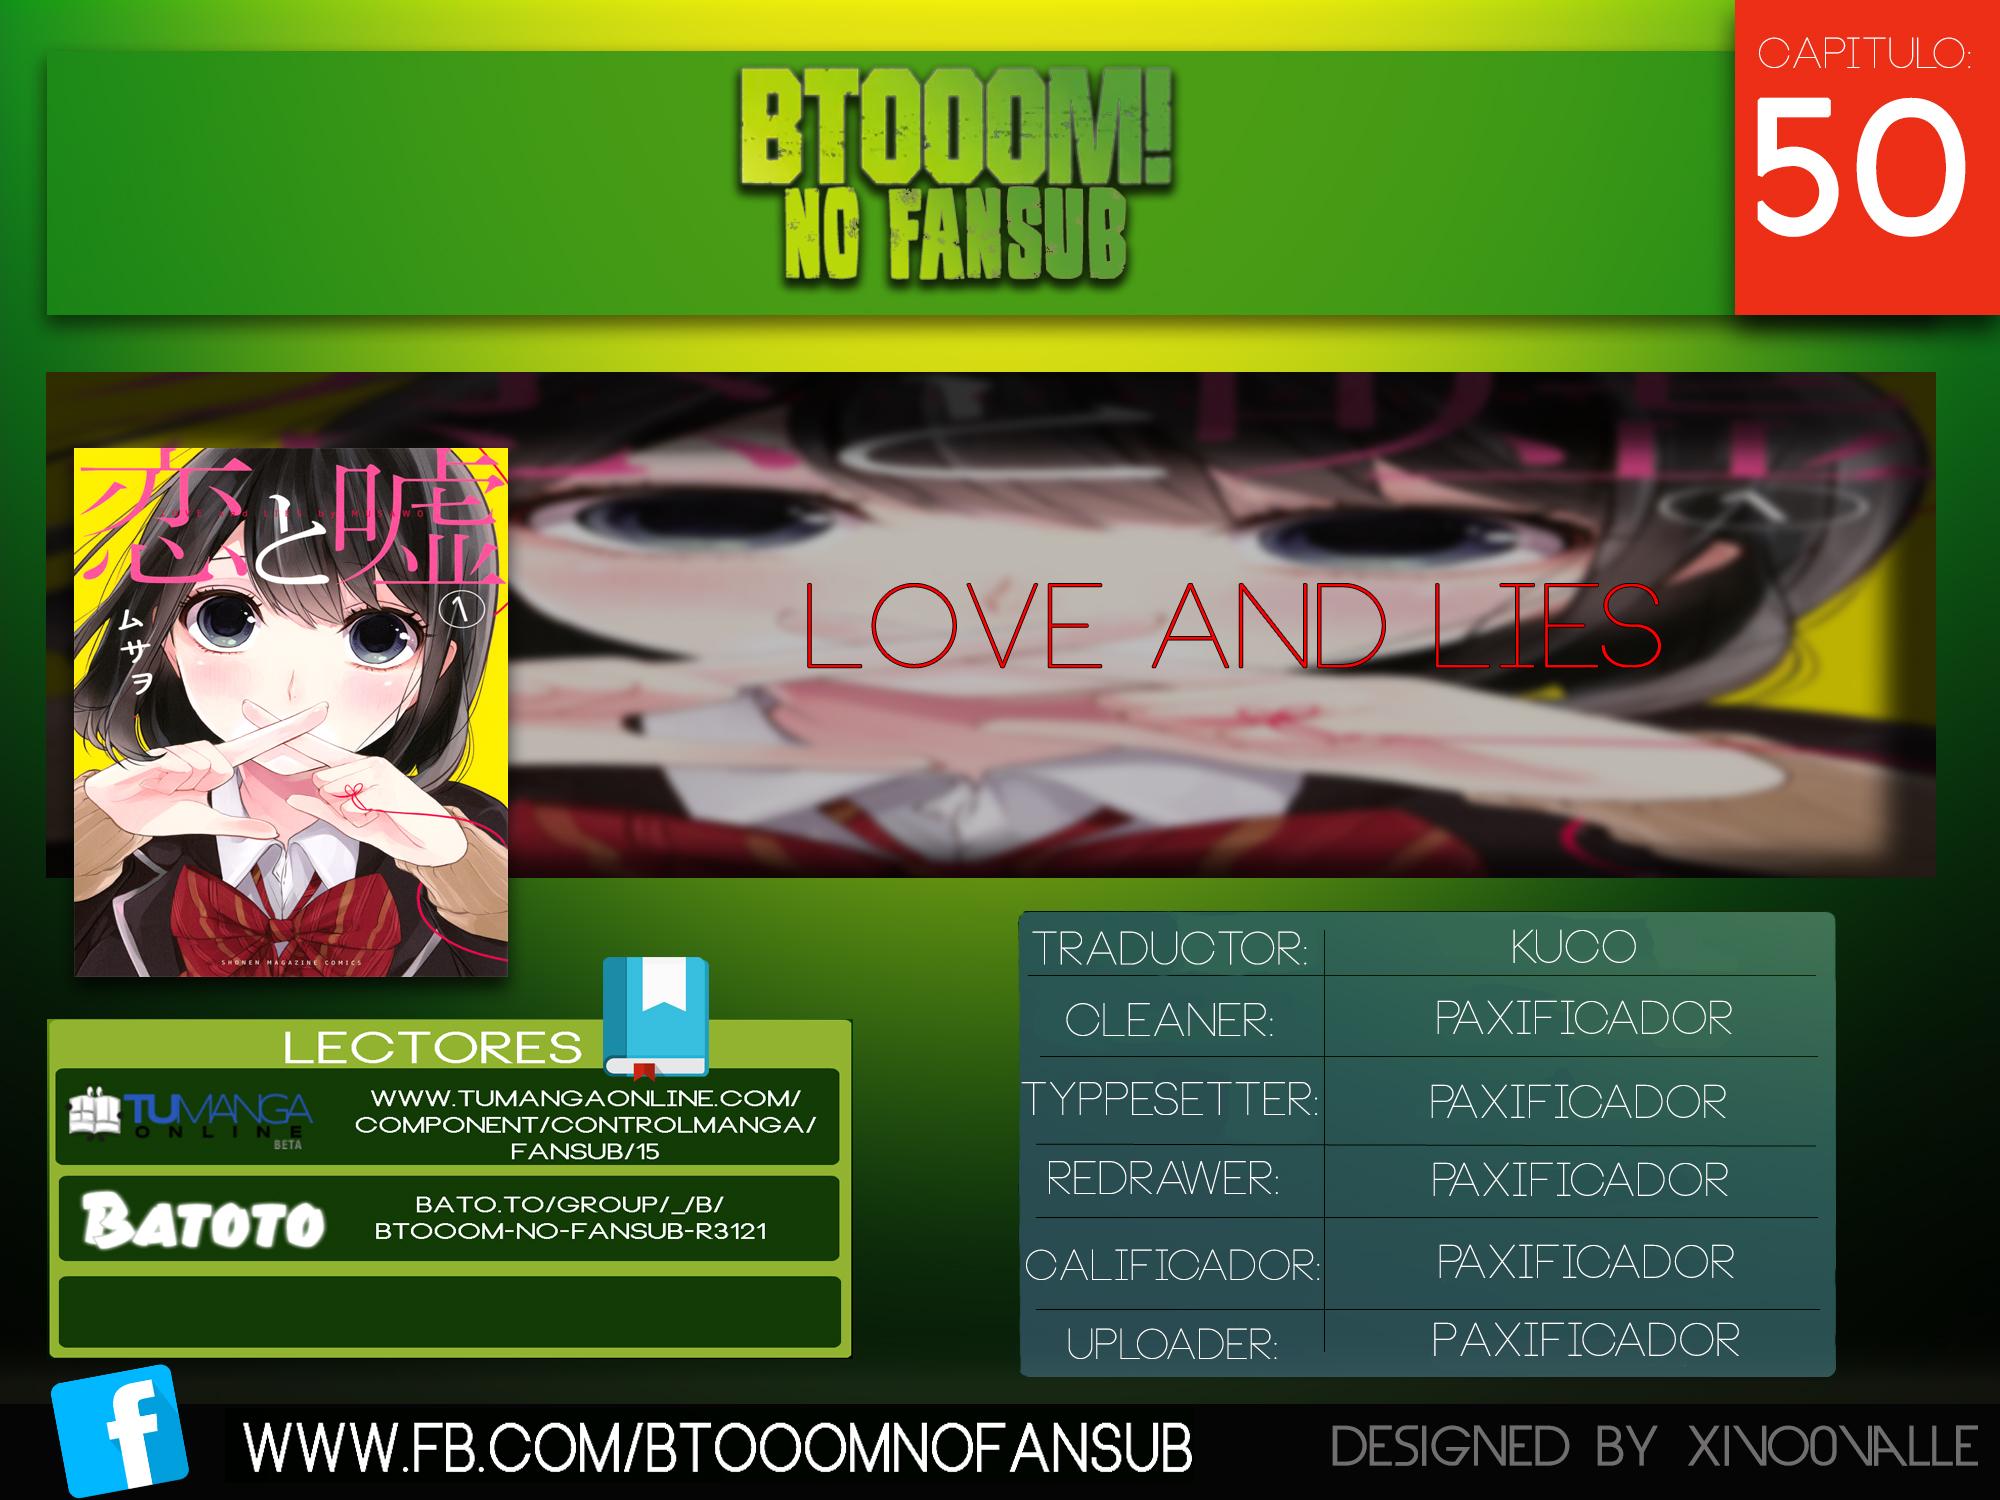 http://c5.ninemanga.com/es_manga/14/14734/394003/a85a7aa7f02d0d91507feda0d20bf904.jpg Page 1